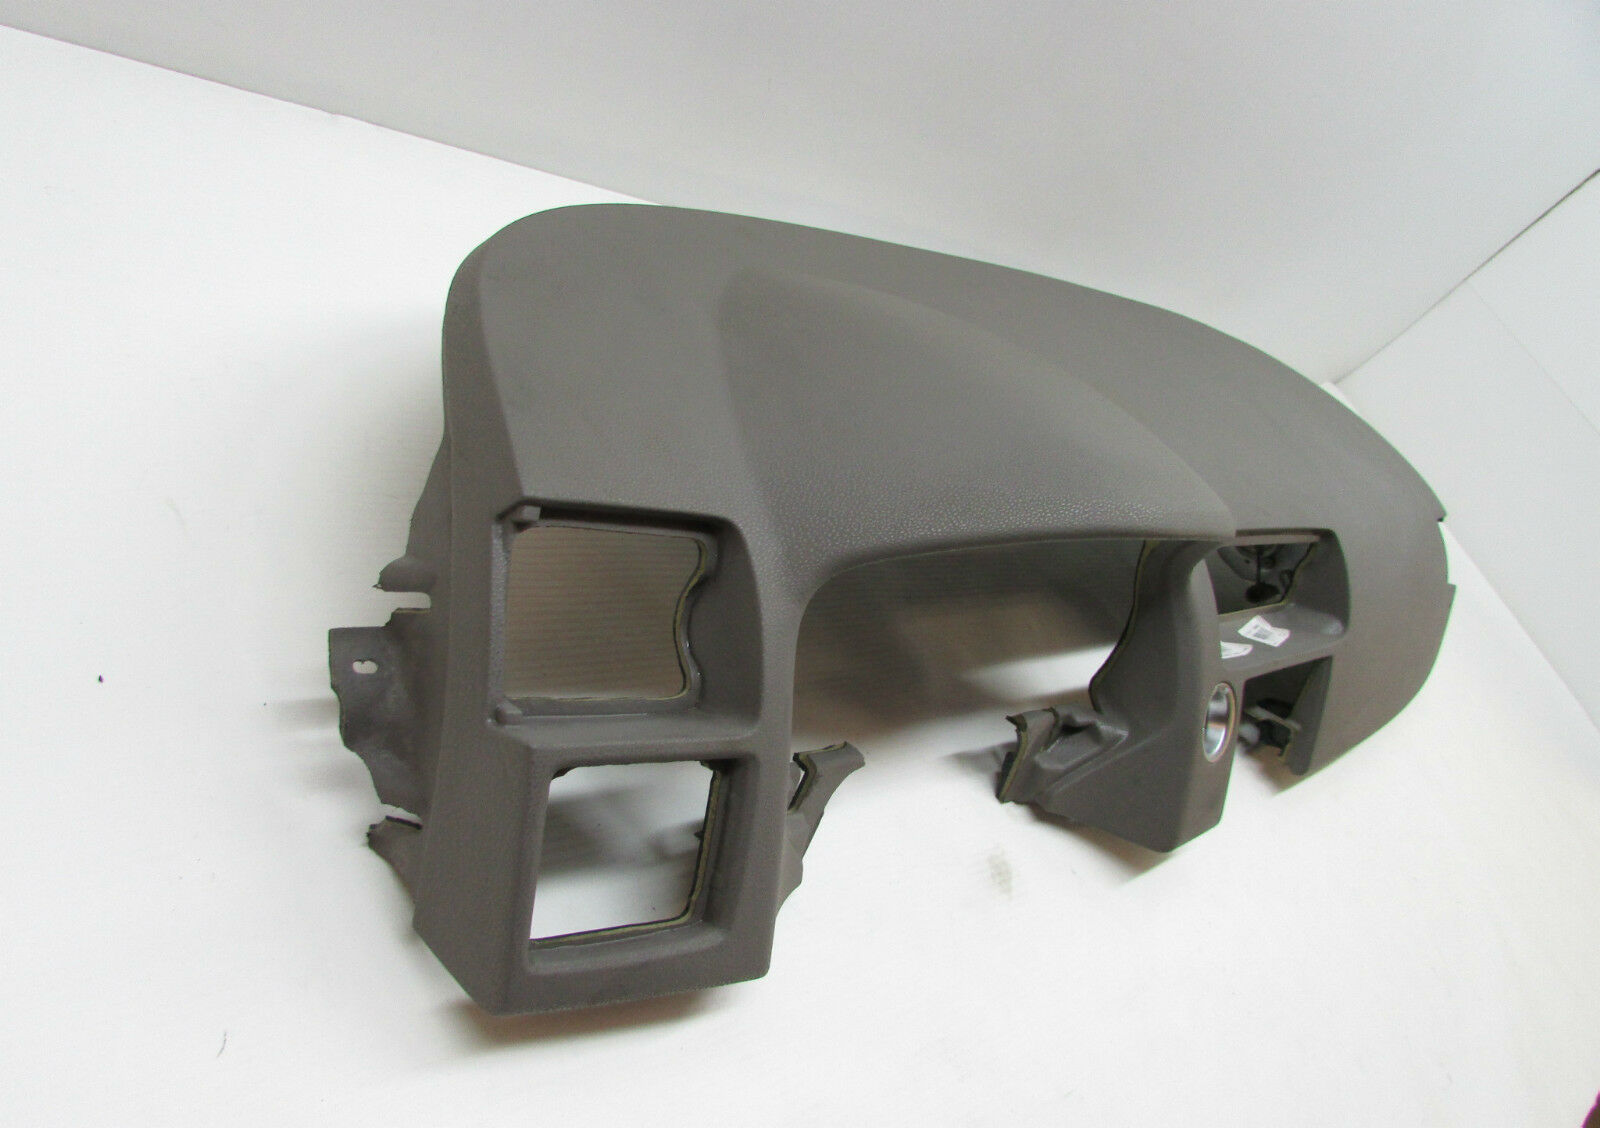 hight resolution of 2007 volvo s40 dash panel w passenger airbag gray 5921 oem 05 06 07 08 09 for sale